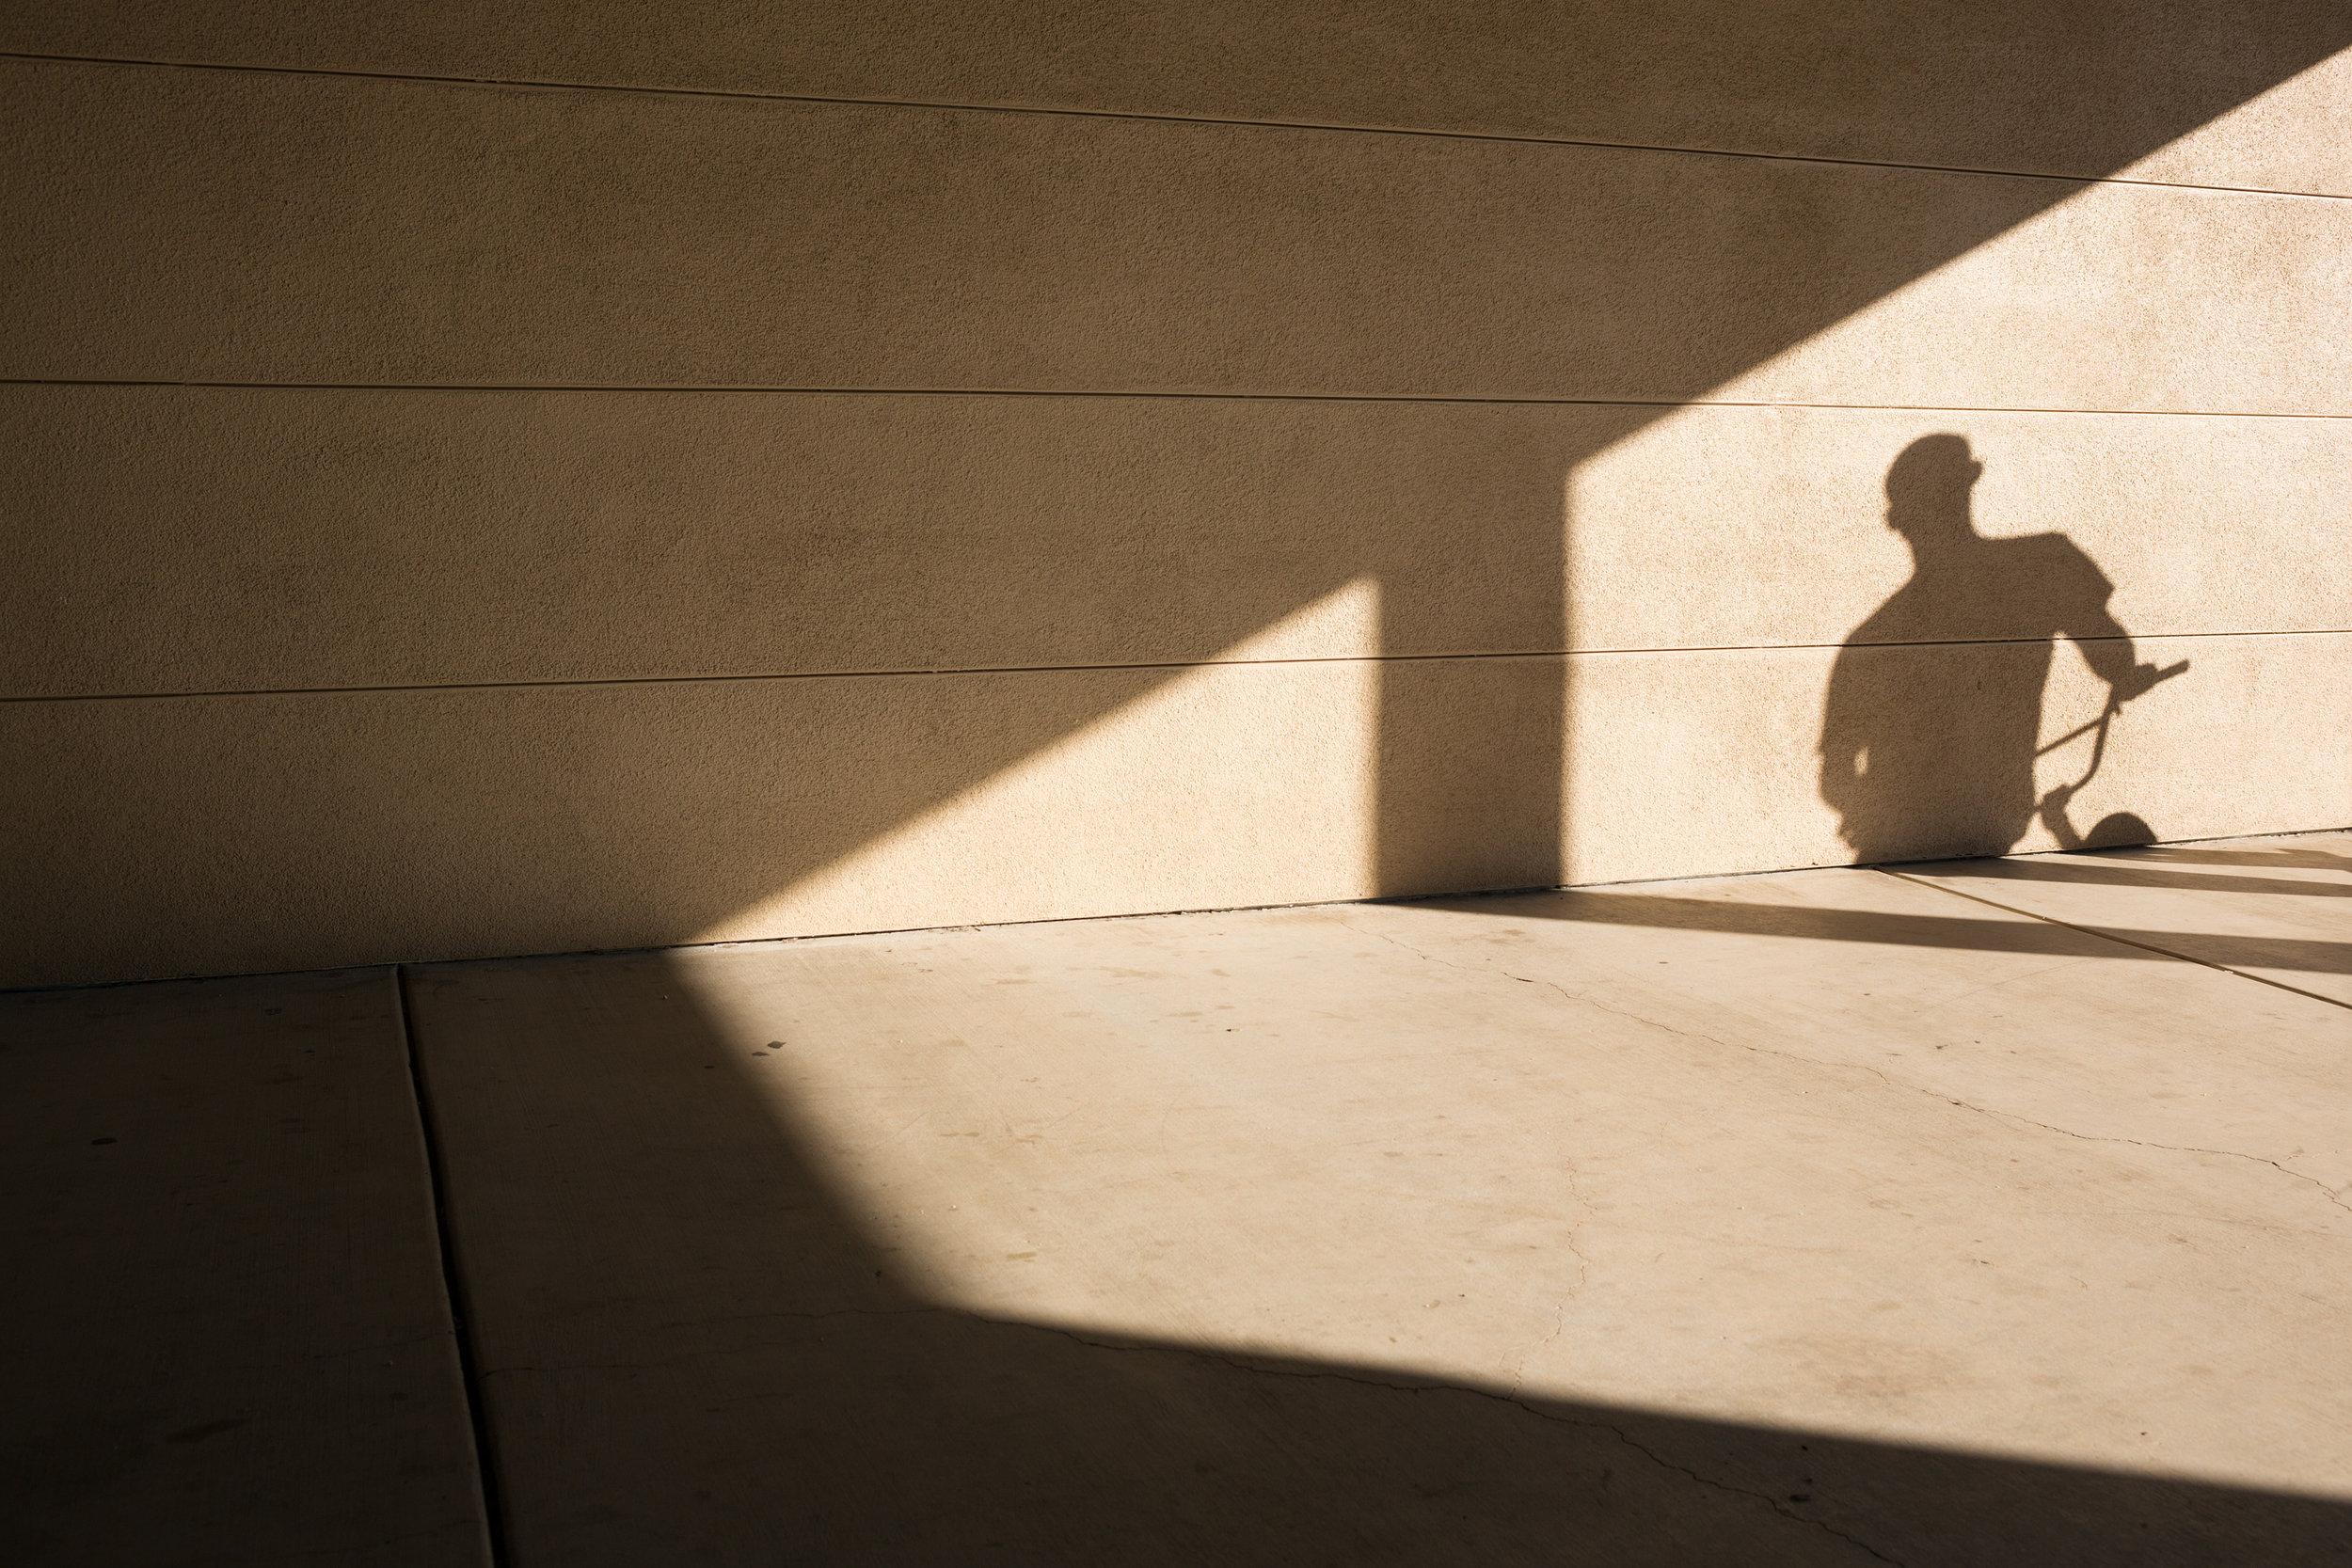 Shadow-Self-Portrait-1-Devin-Feil.jpg